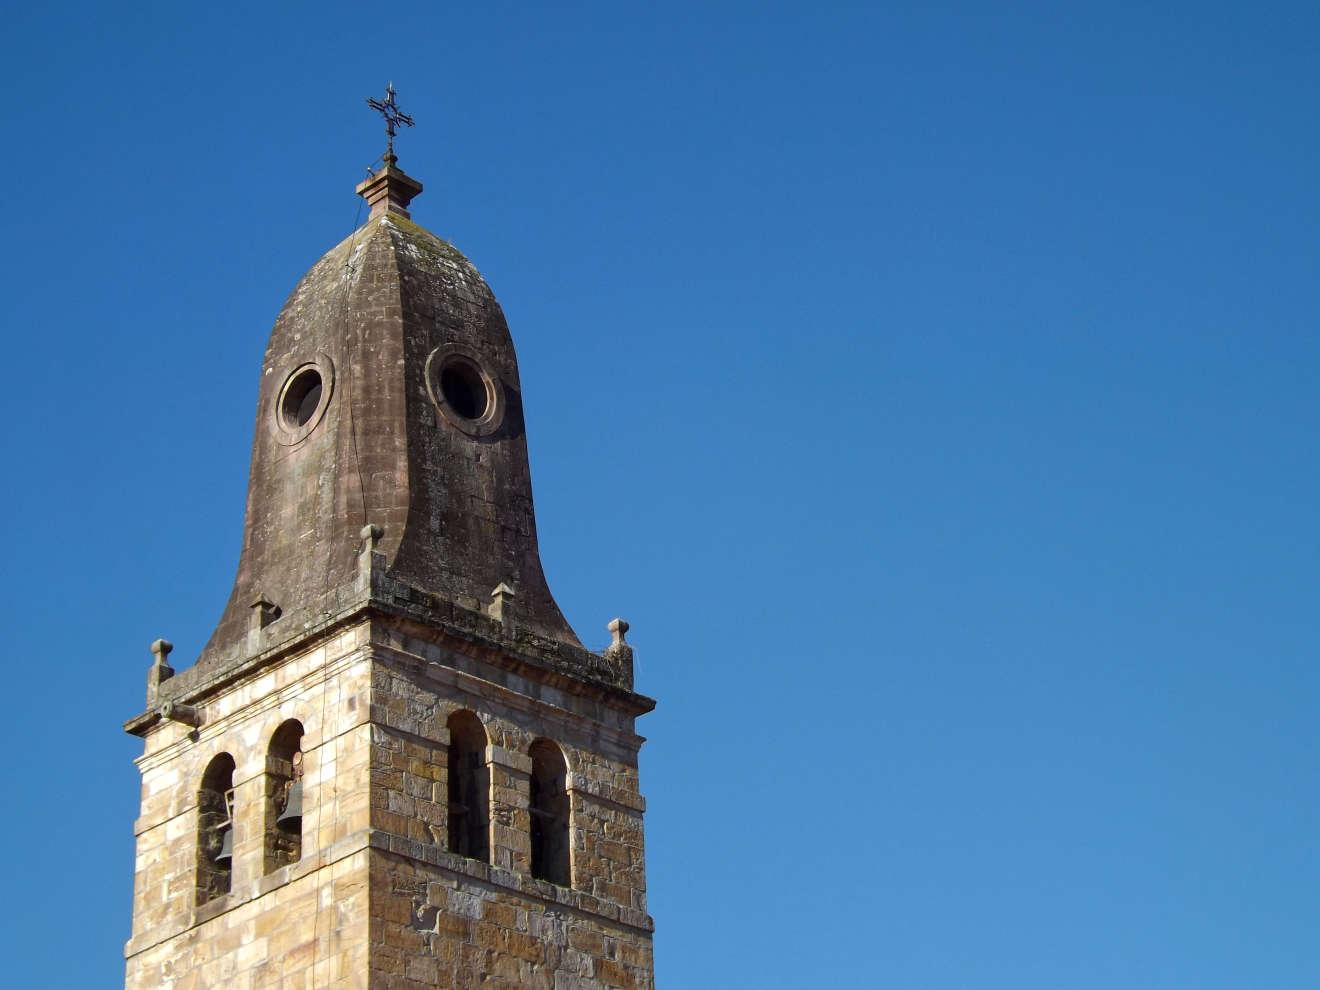 Torre de la iglesia de Cabezón de la Sal